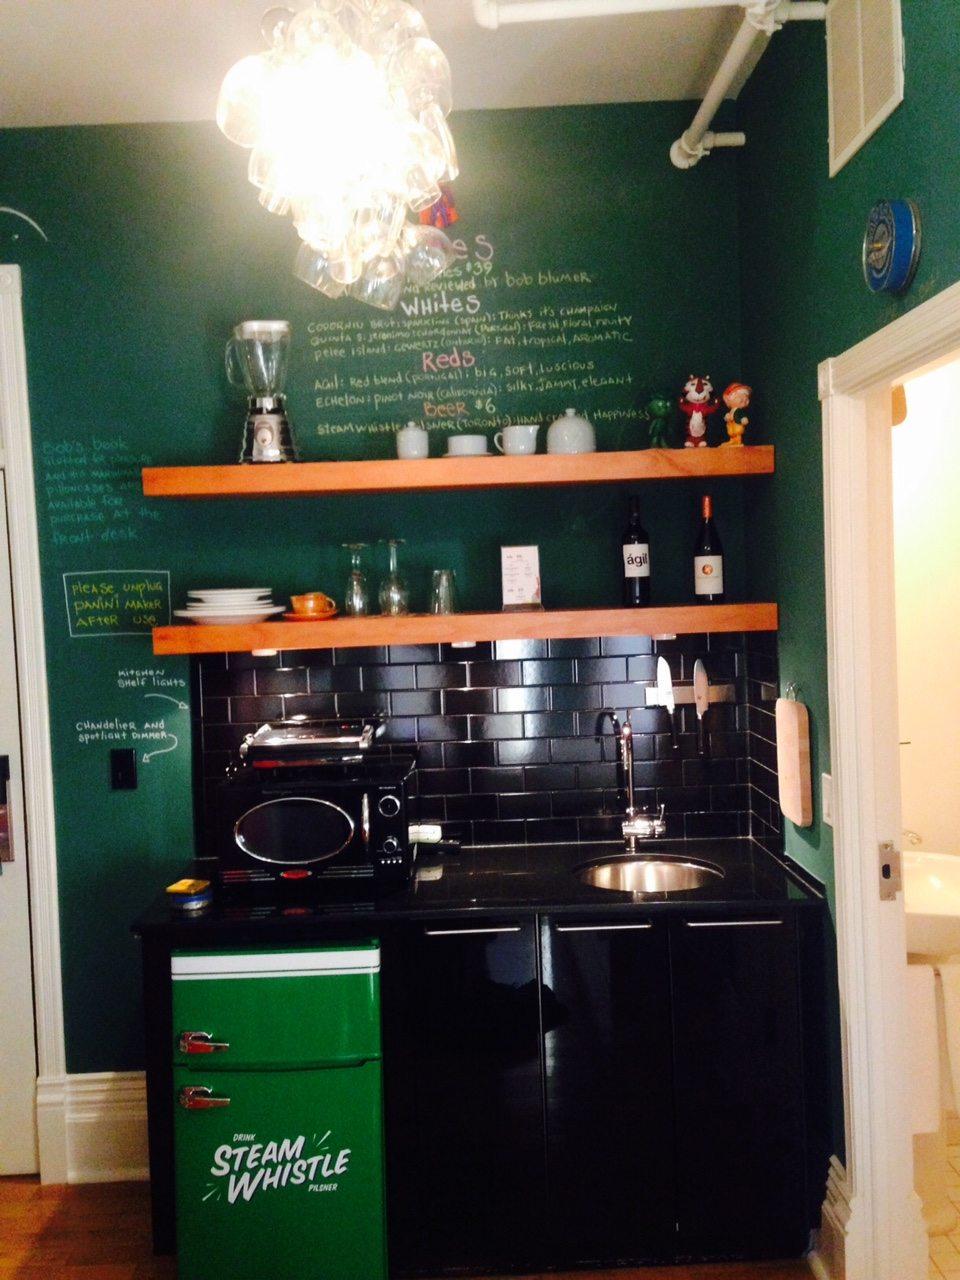 toronto-chefs-restaurants-consumed-bob-blumer-food-network-surreal-gourmet-gladstone-hotel-kitchenette